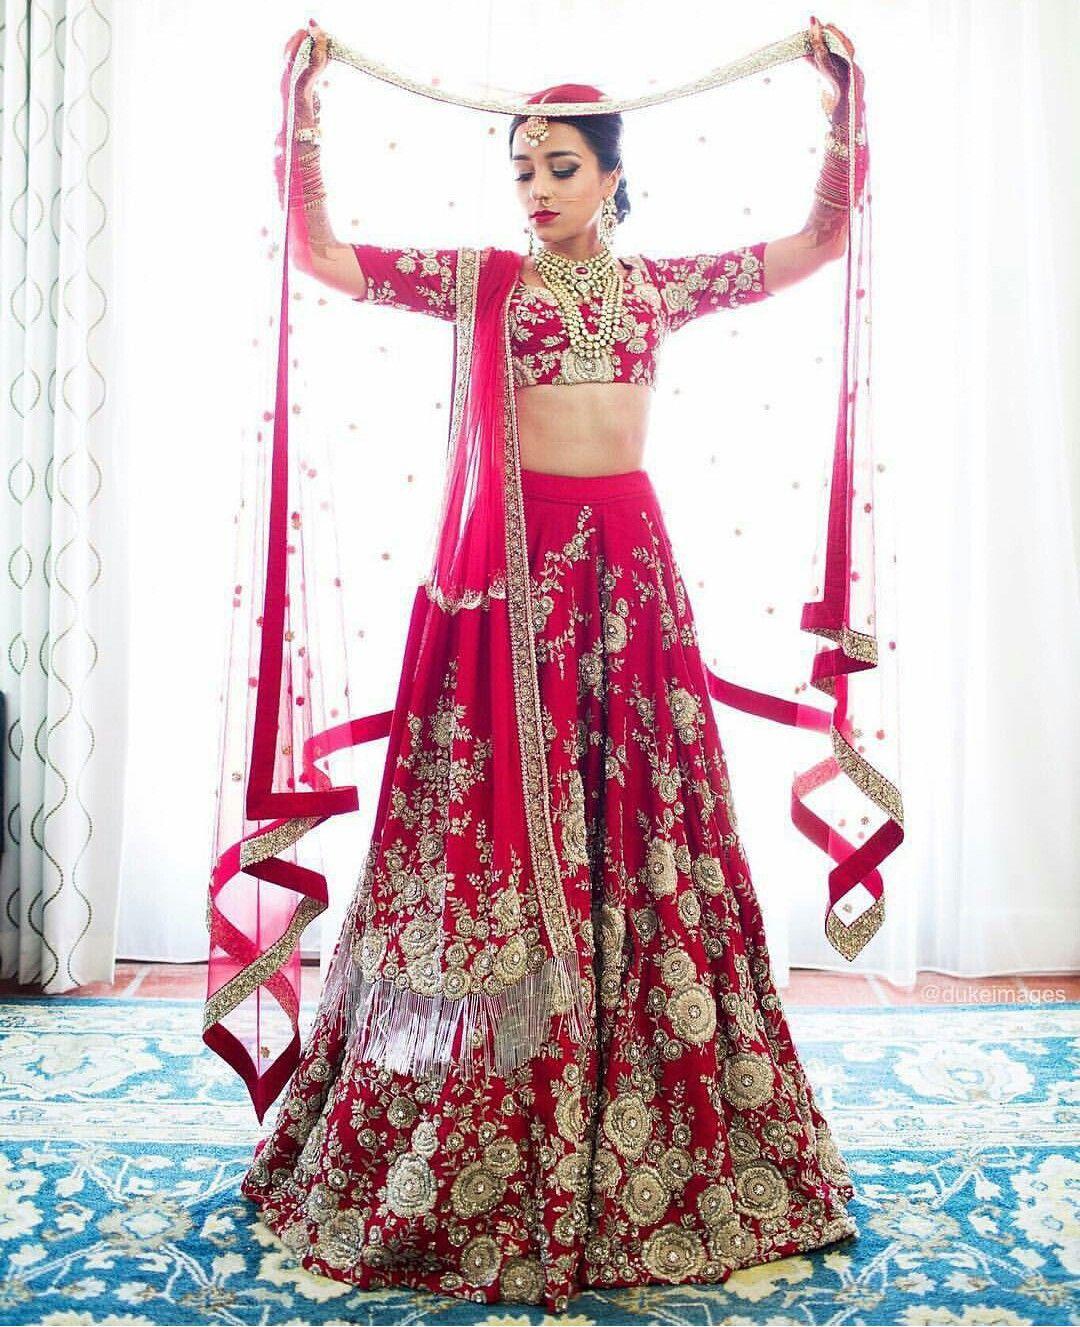 Pin de Yashodara Rathnathilaka en Indian and Pakistani Brides ...